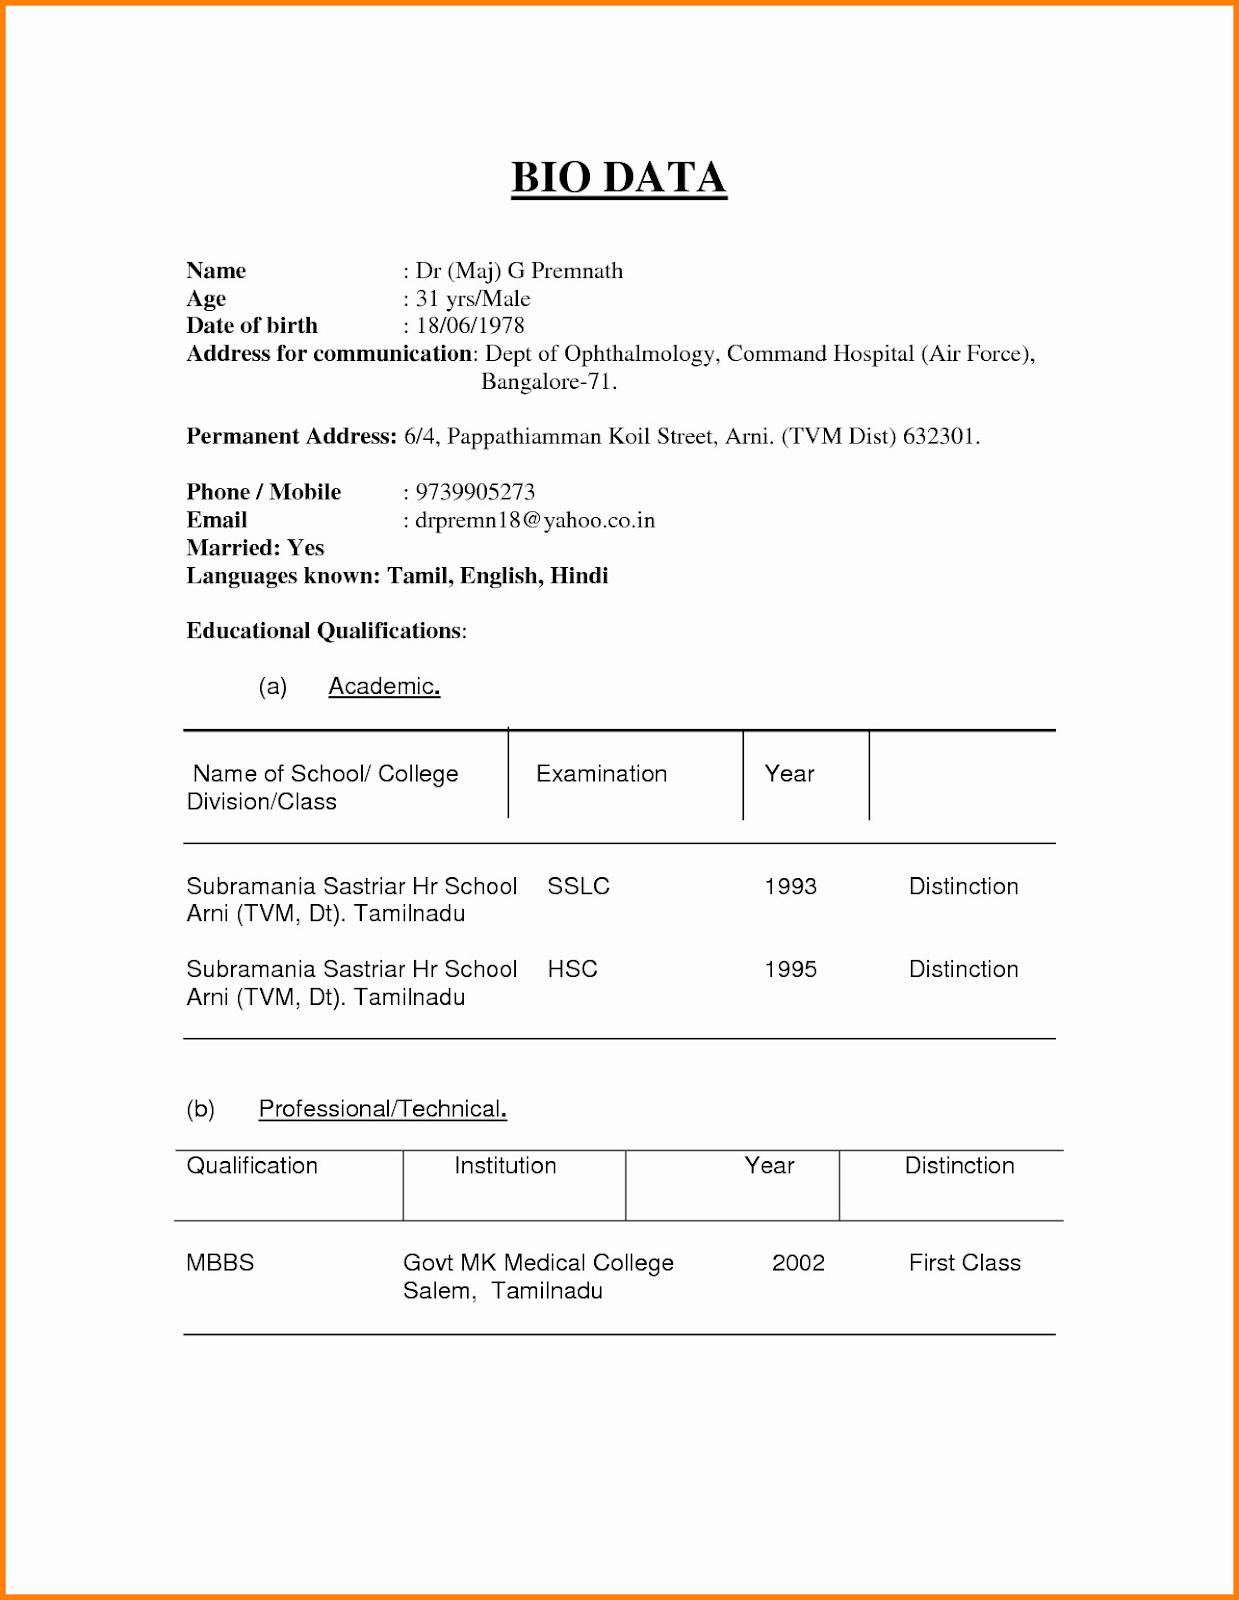 biodata template word biodata template pdf biodata template for marriage biodata template for marriage for boy biodata template free download